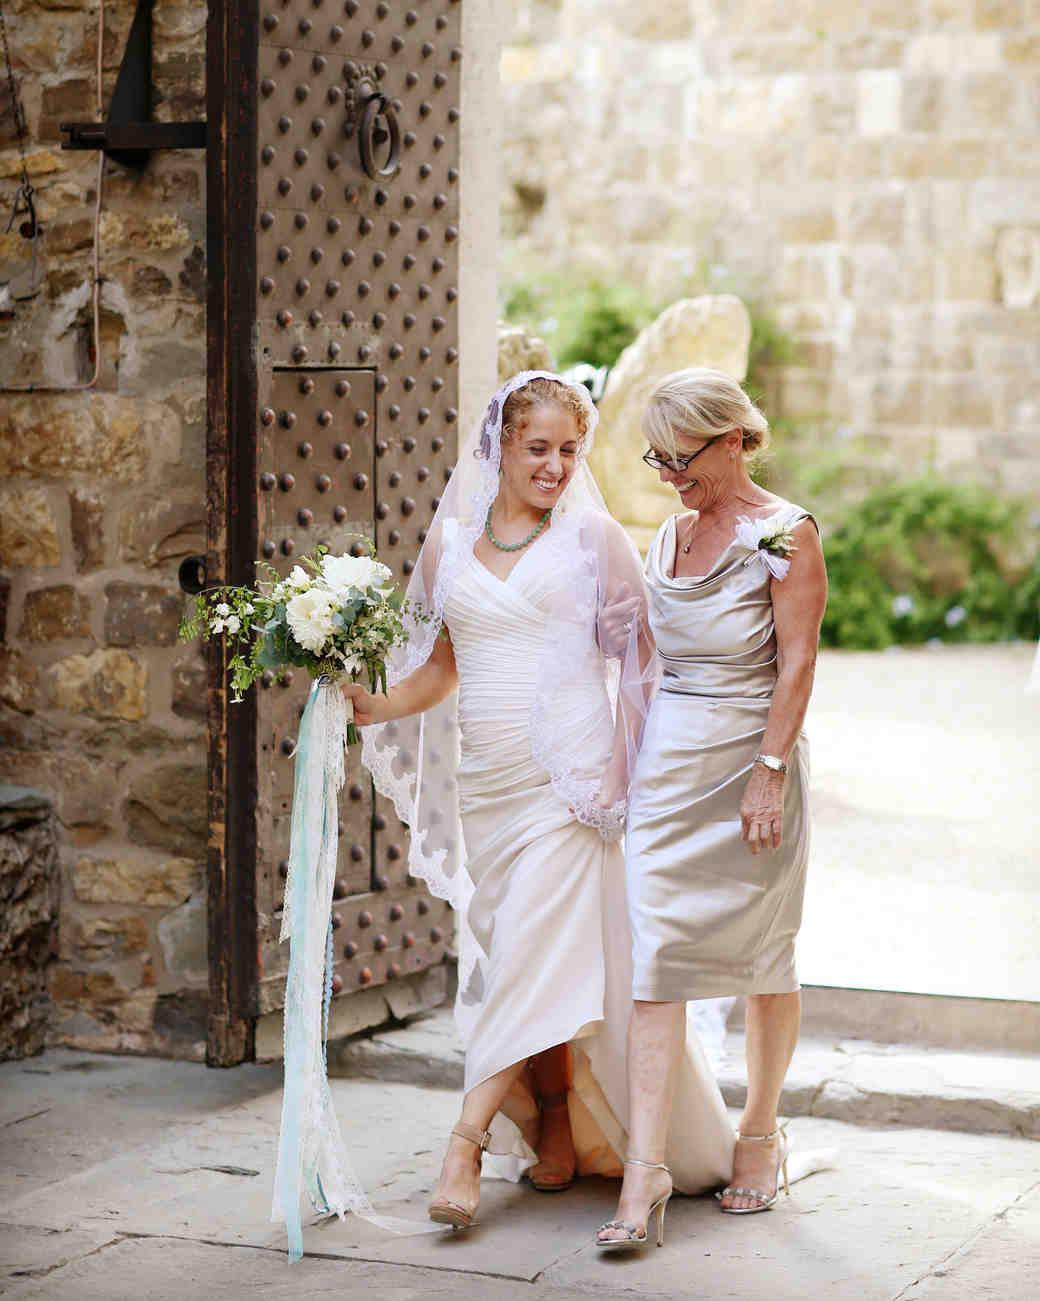 mother of the bride dresses wowed weddings mothers wedding dresses Mother of the Bride Dresses That Wowed at Weddings Martha Stewart Weddings